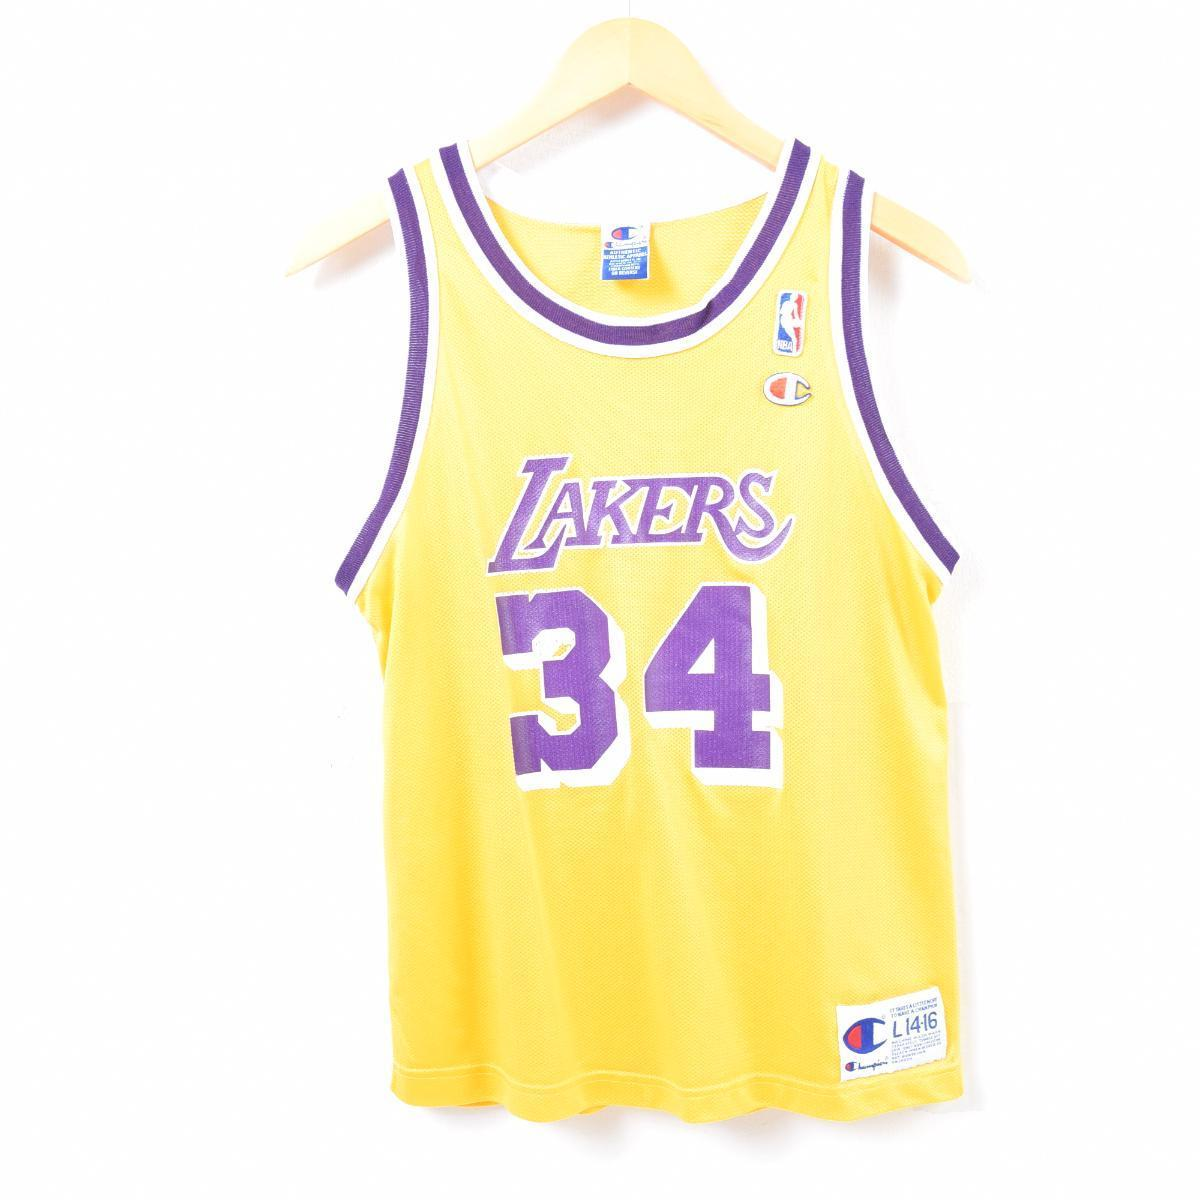 90s champion Champion NBA LOS ANGELES LAKERS Los Angeles Lakers Shaquille  O Neal Shaquille O Neal game shirt replica uniform men S  waq7203 21454892c